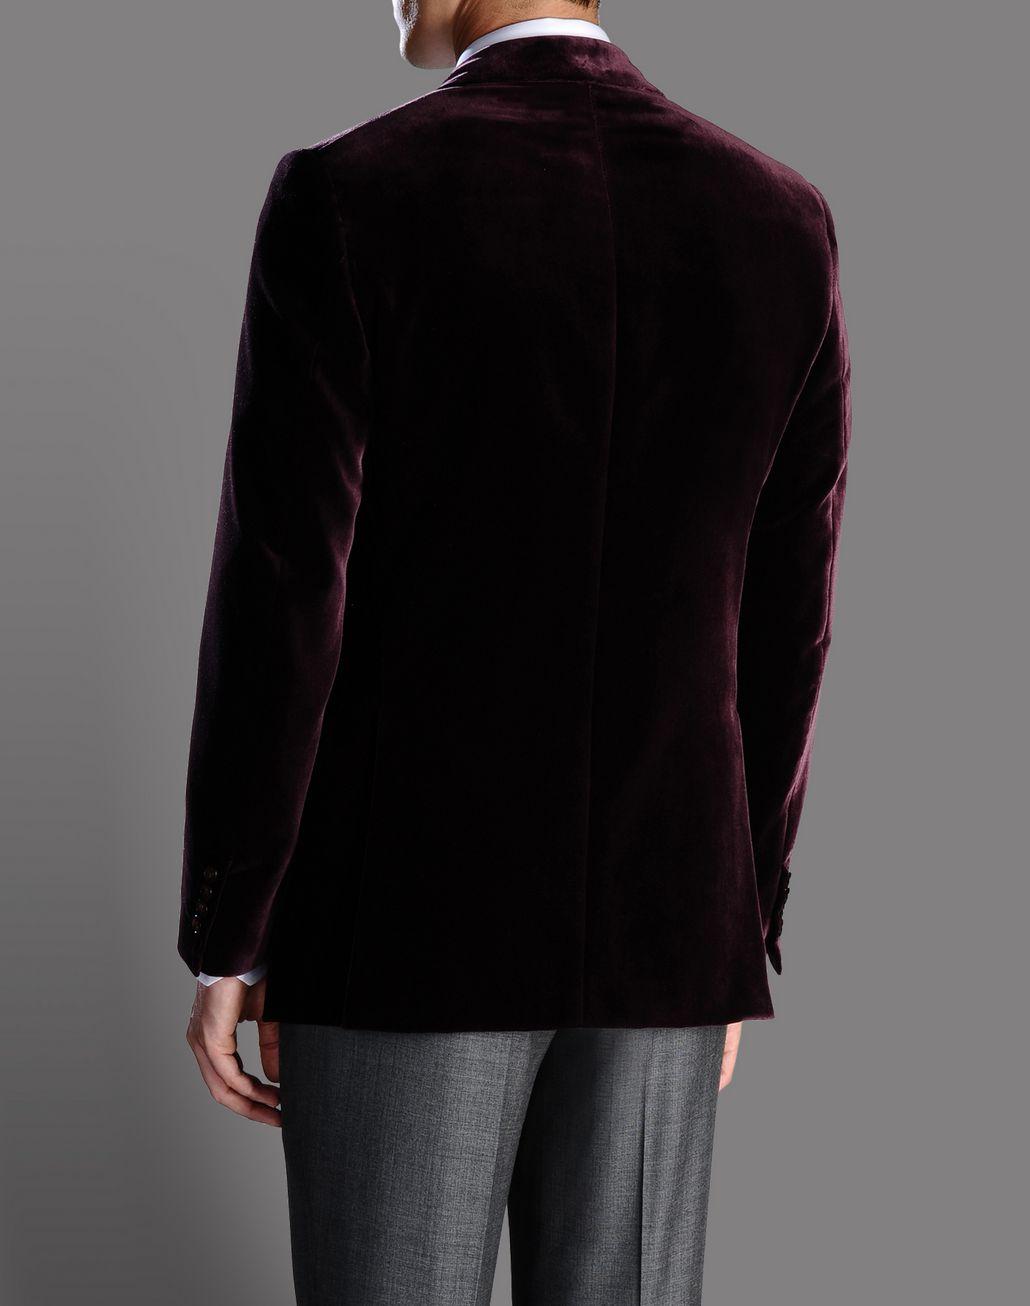 BRIONI burgundy velvet jacket with peaked lapels Suits & Jackets U r